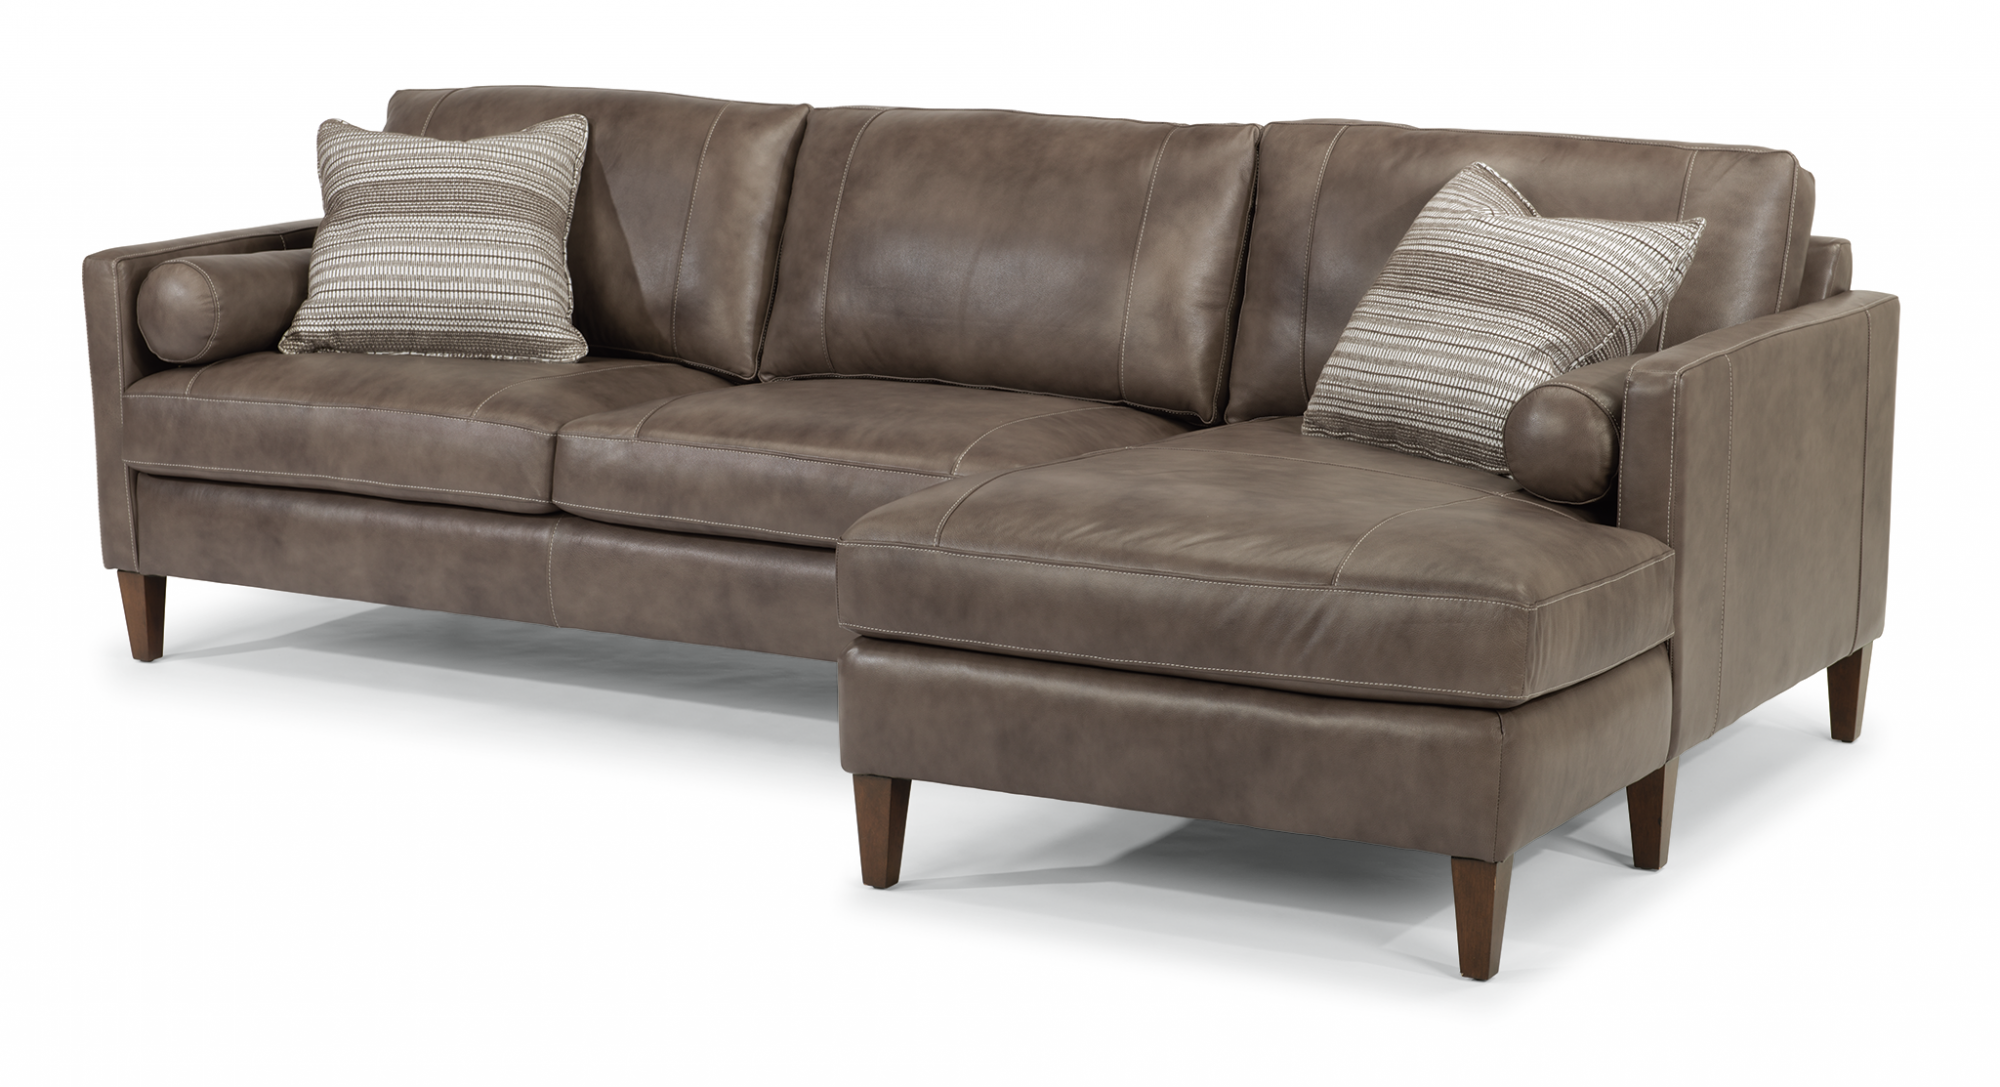 Astounding Flexsteel 1195 Sect Vivian Leather Sectional Reese Evergreenethics Interior Chair Design Evergreenethicsorg